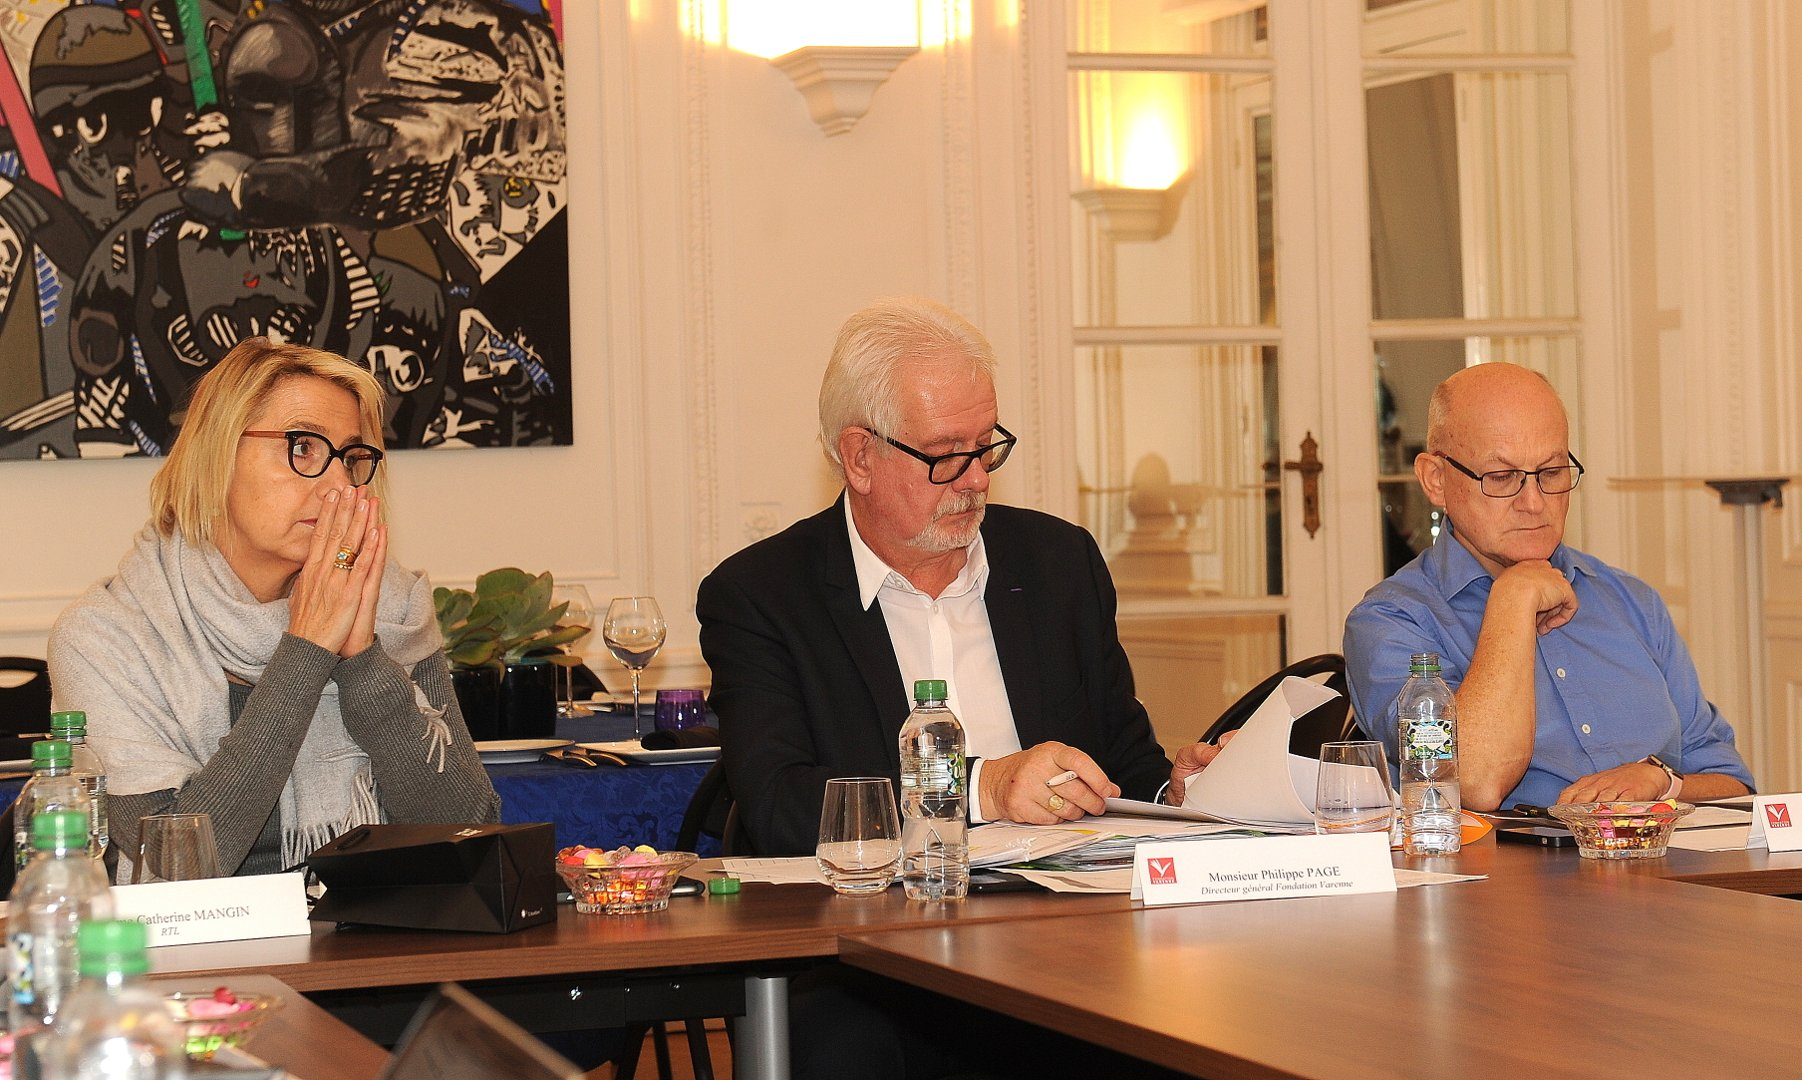 Le jury radio avec à gauche Catherine Mangin (RTL) présidente du jury, Philippe Page et Bruno Denaes (Radio France)